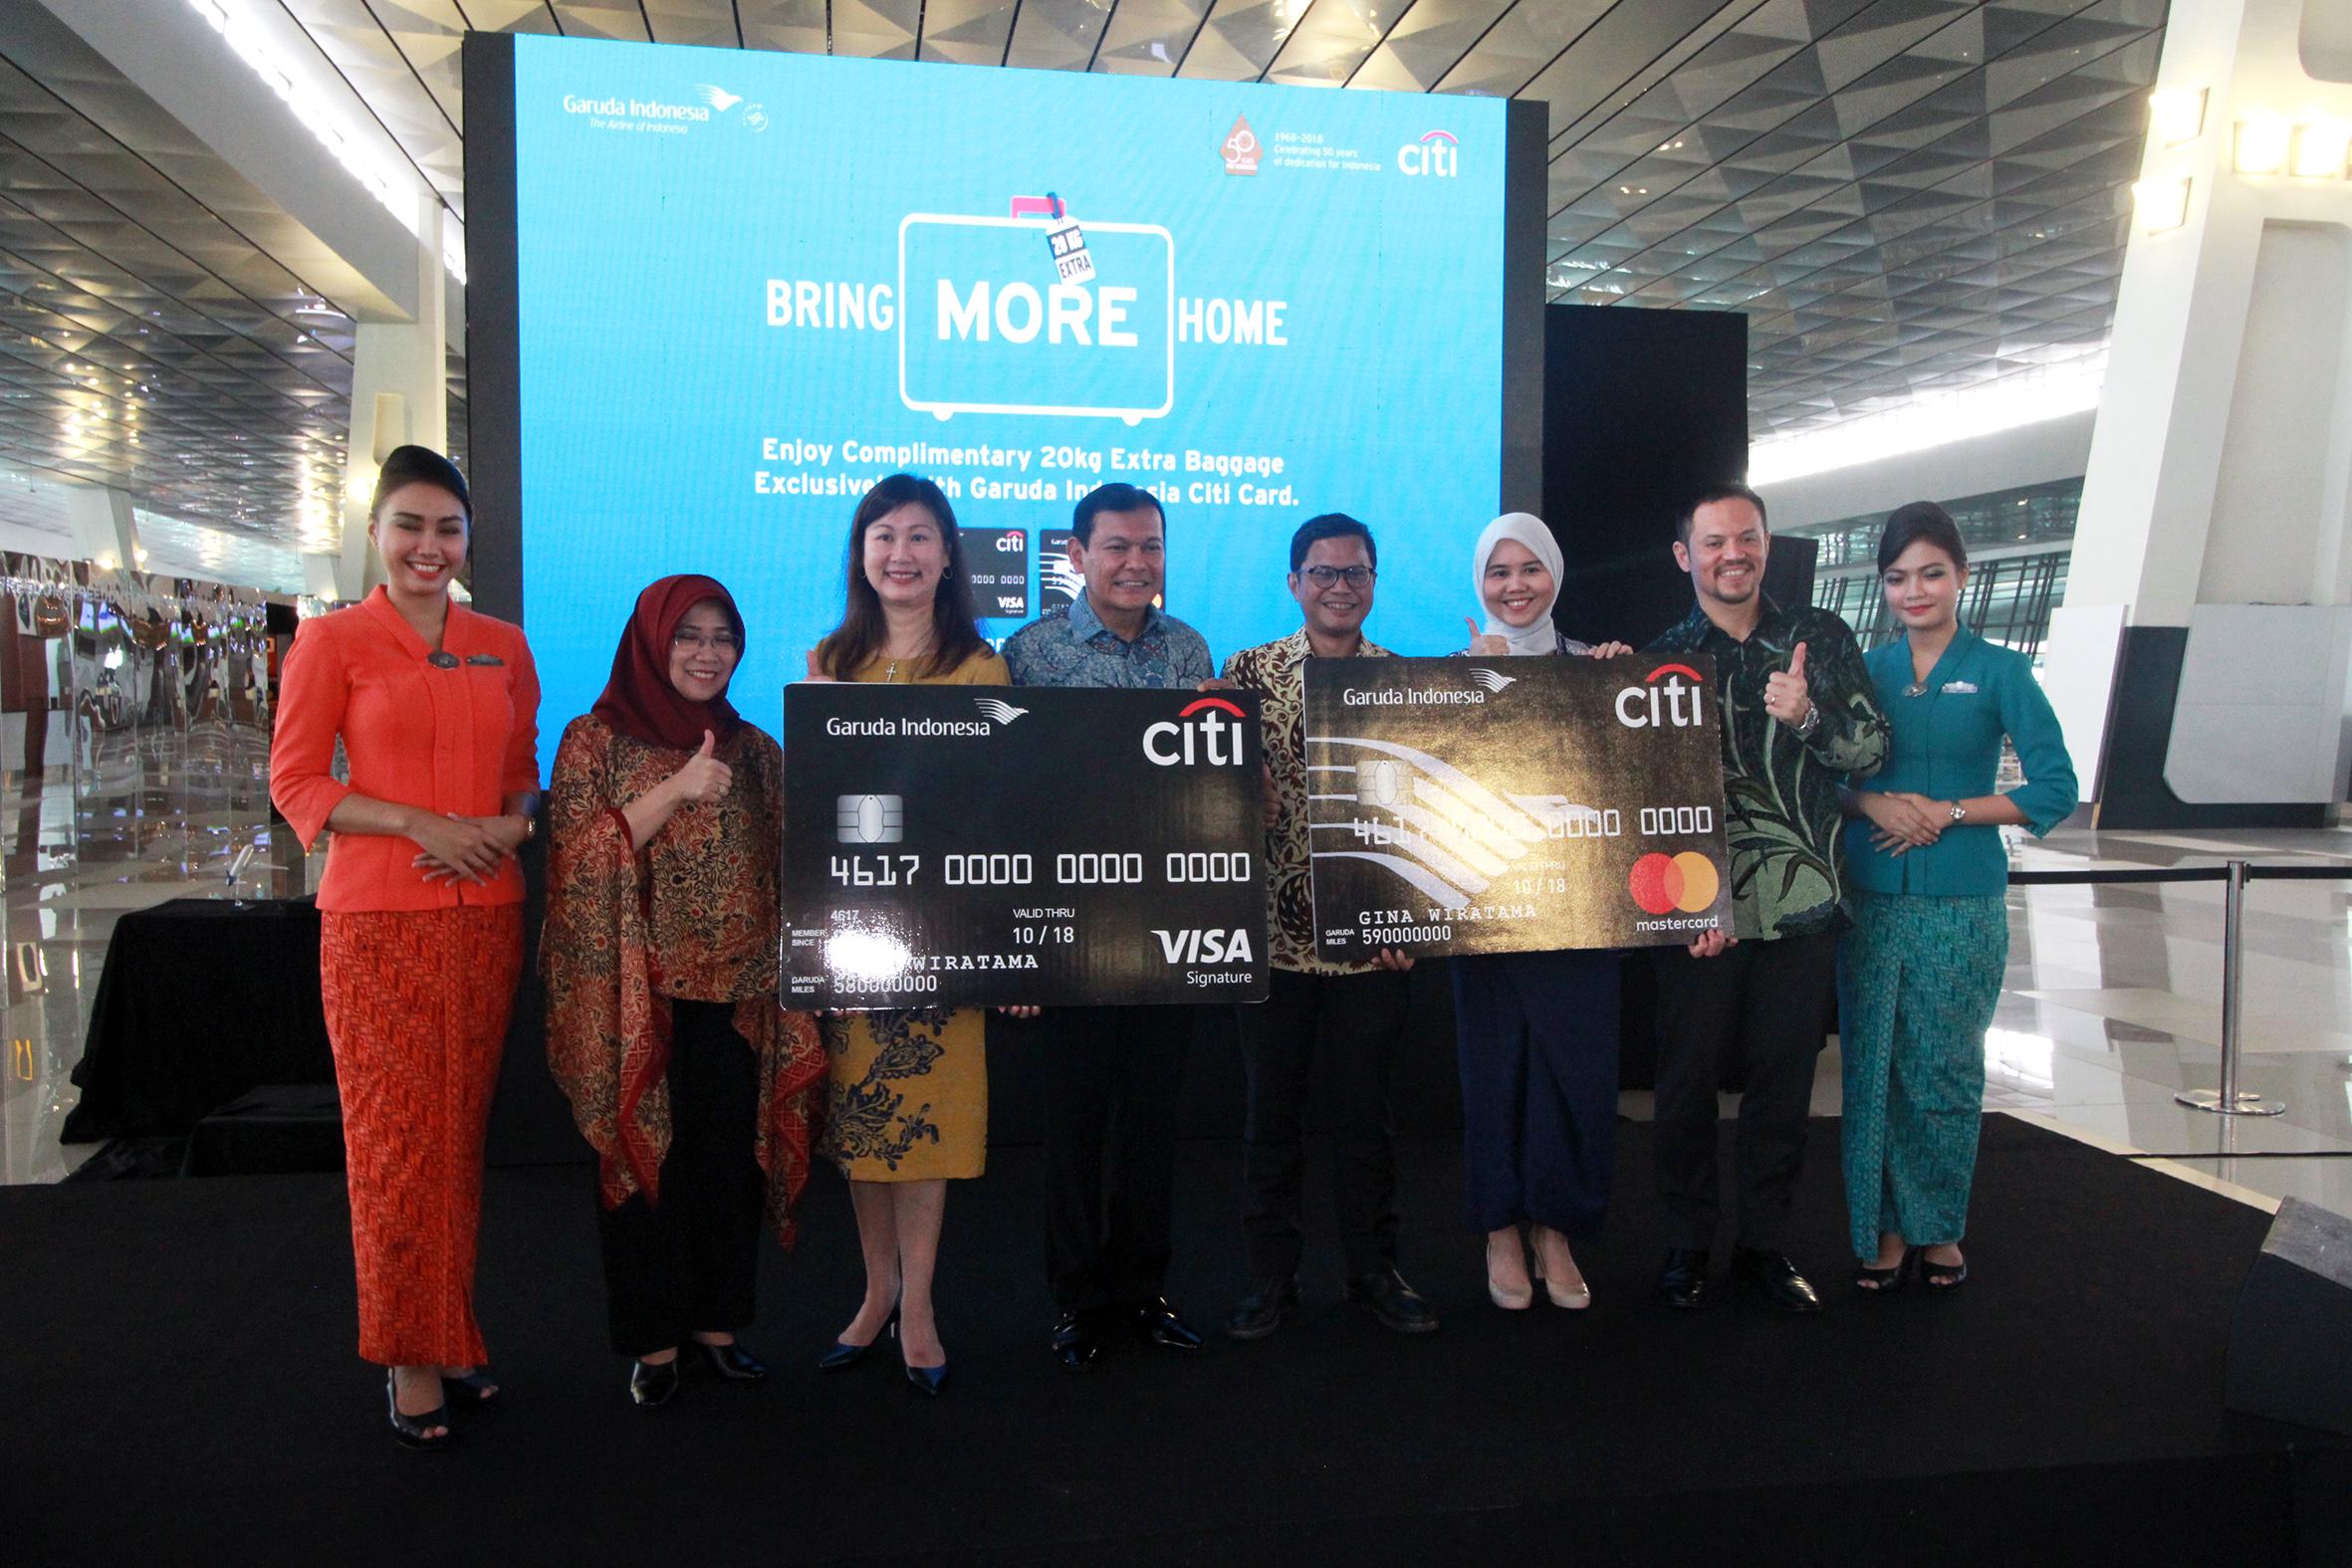 Kolaborasi Garuda Indonesia Bersama Citi Card